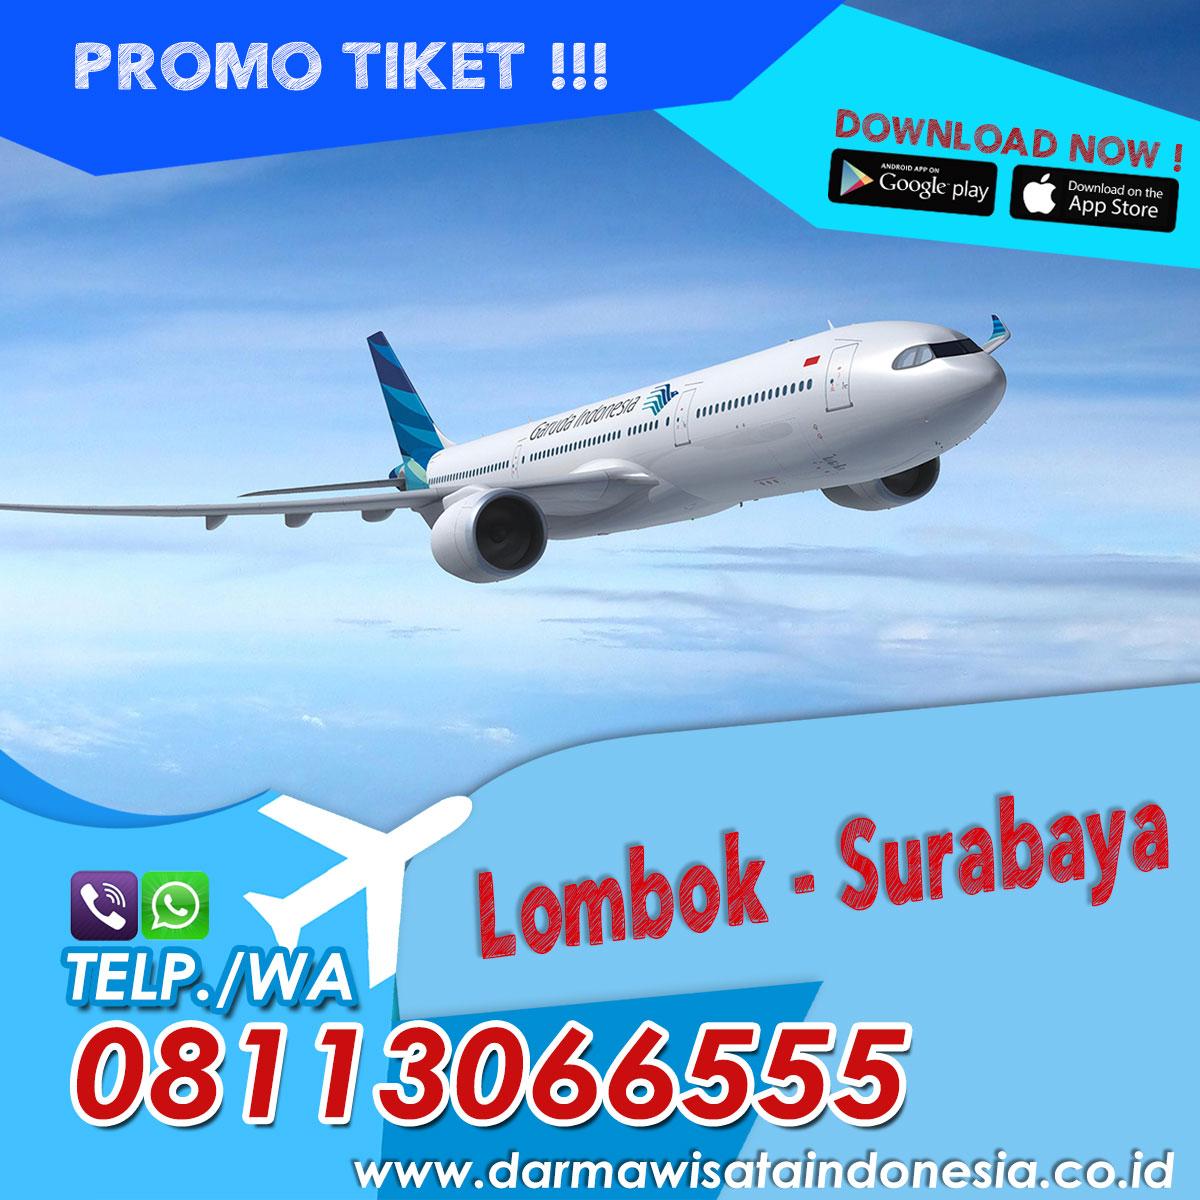 jual promo tiket pesawat murah lombok surabaya free tiket rh tokopedia com harga tiket pesawat lombok bima harga tiket pesawat lombok jakarta